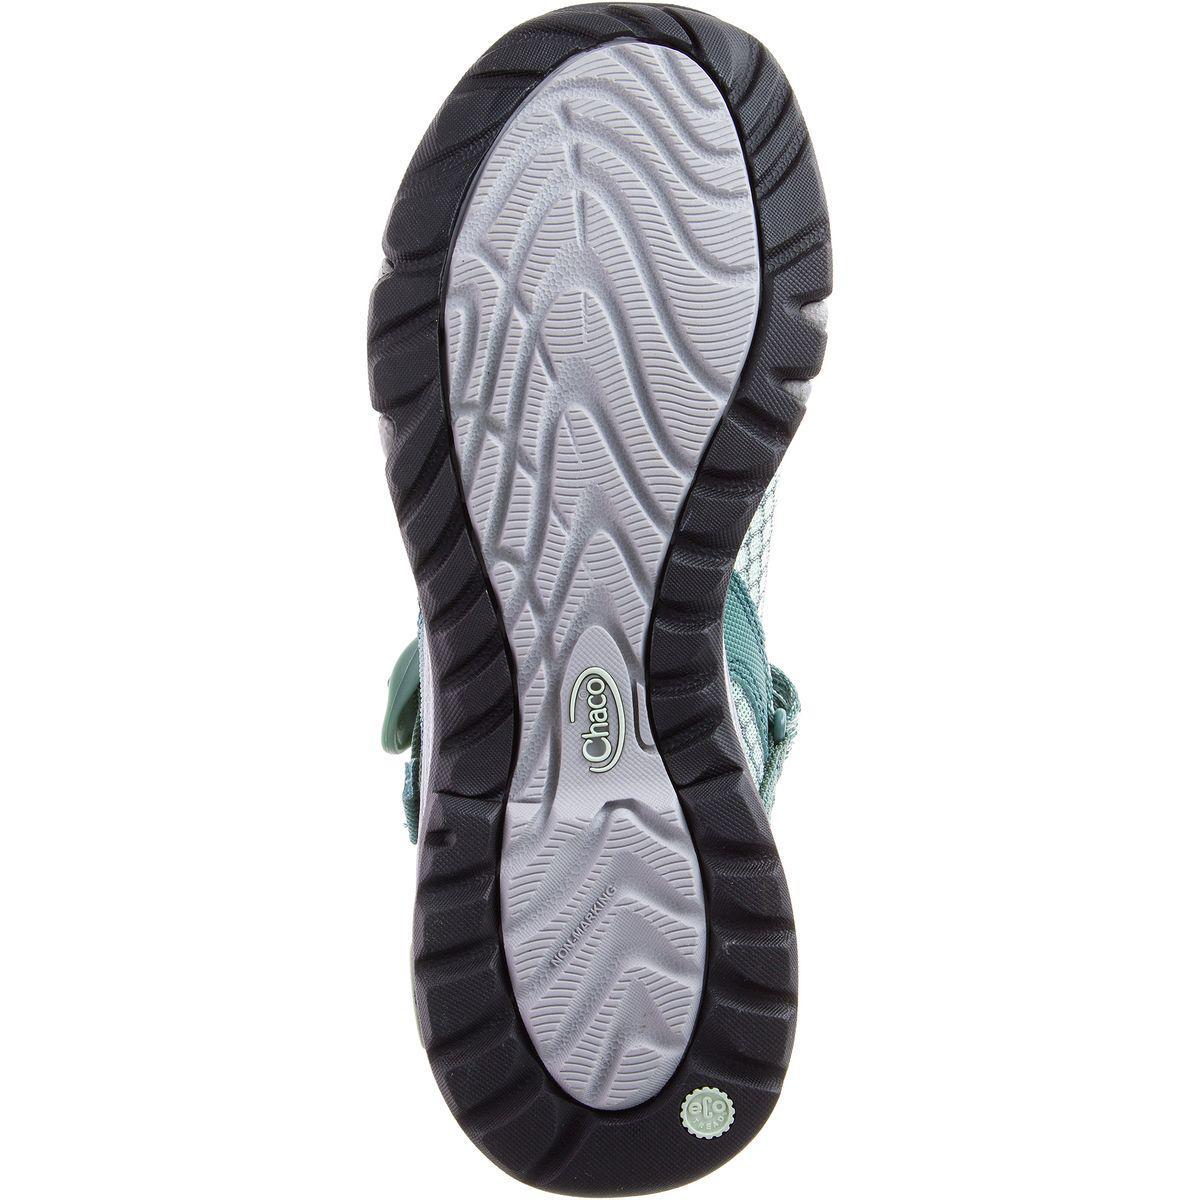 76e0a780e3be Lyst - Chaco Outcross Evo Mj Water Shoe in Blue